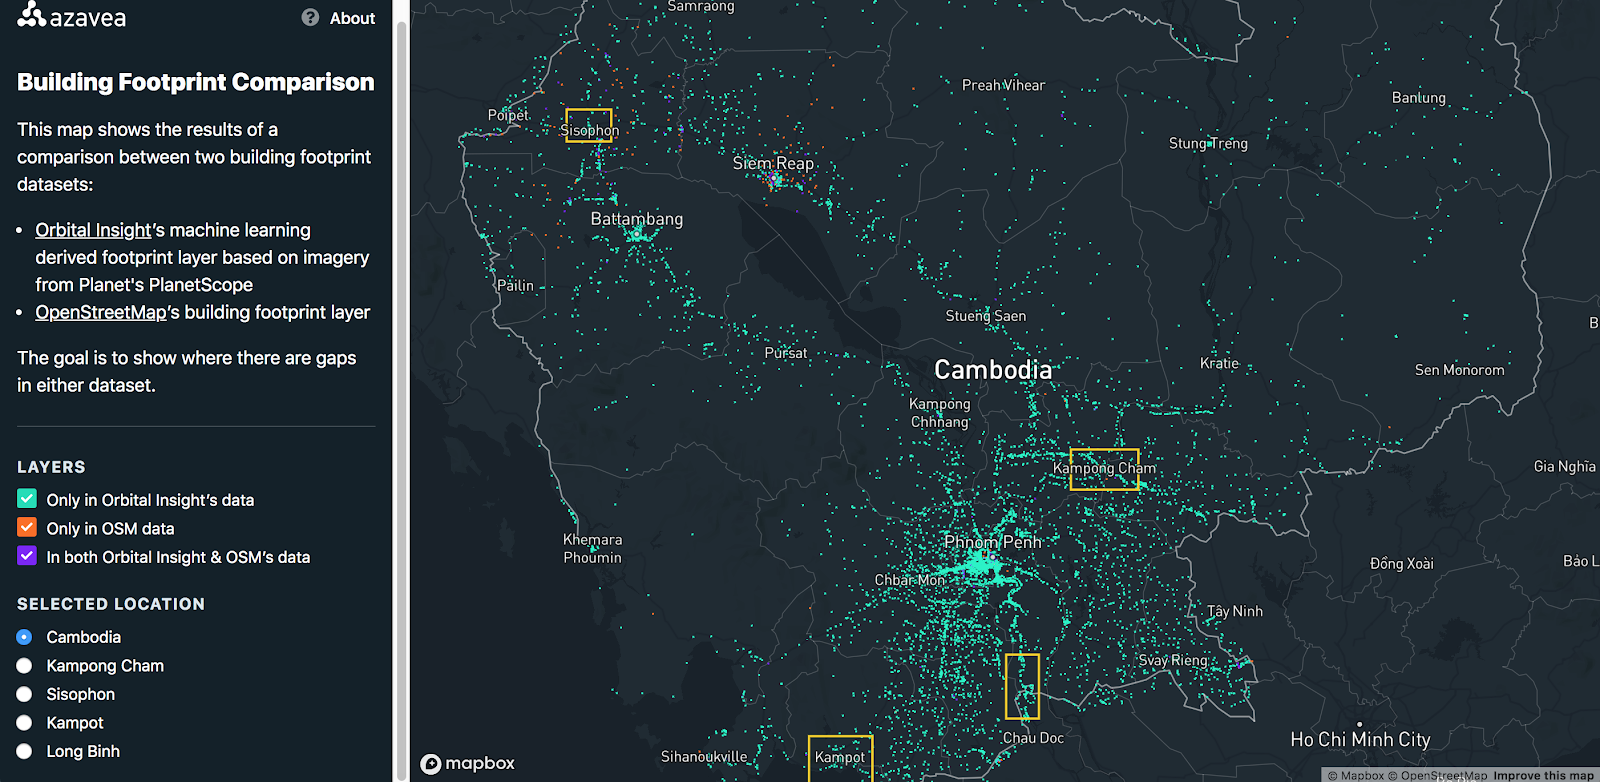 orbital insight versus open street map